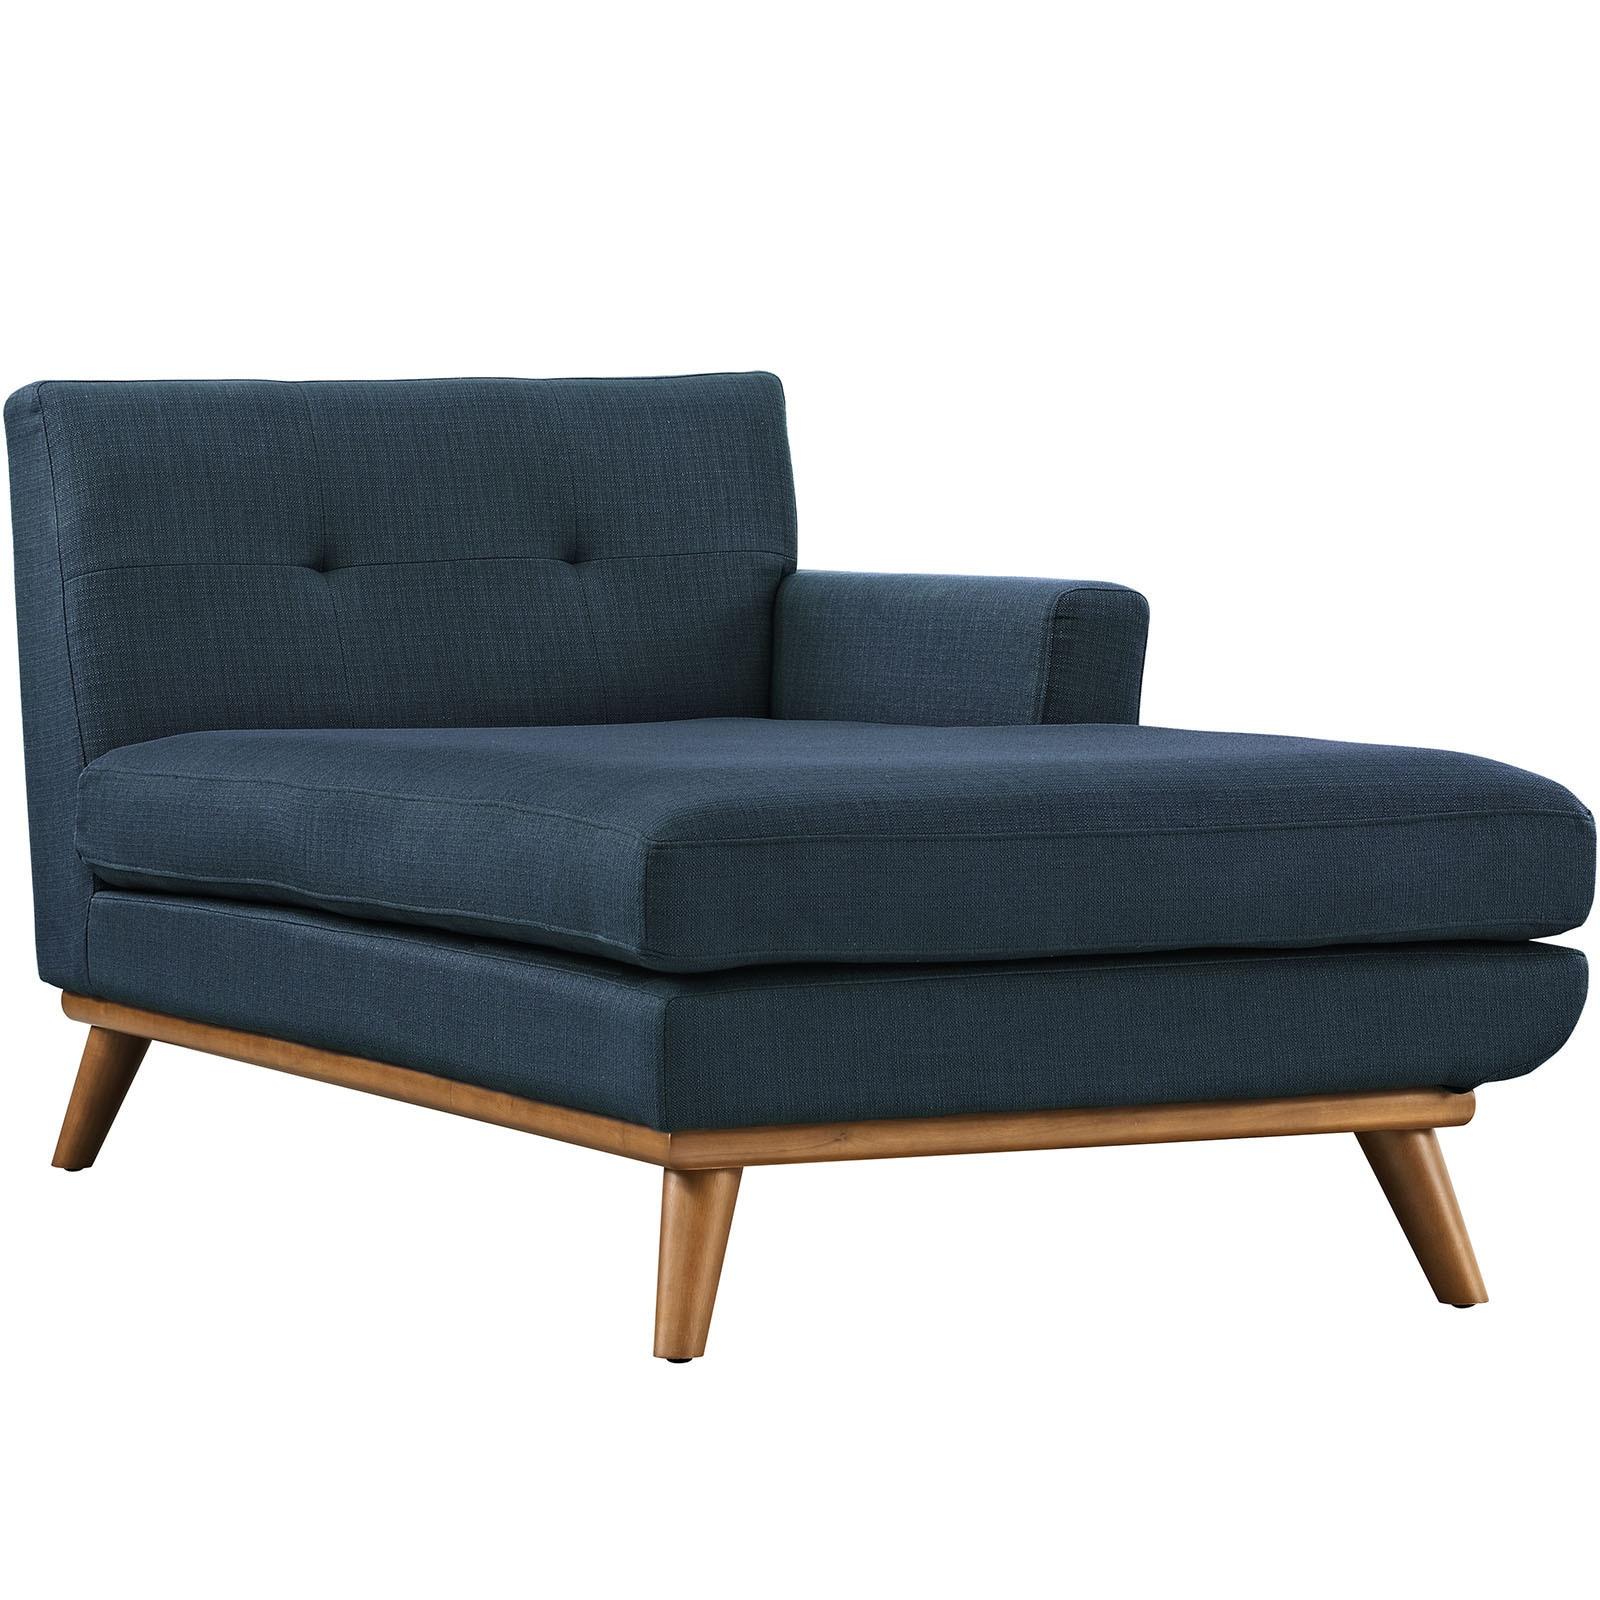 Carson Carrington Ringsaker Right Arm Chaise Sectional Sofa